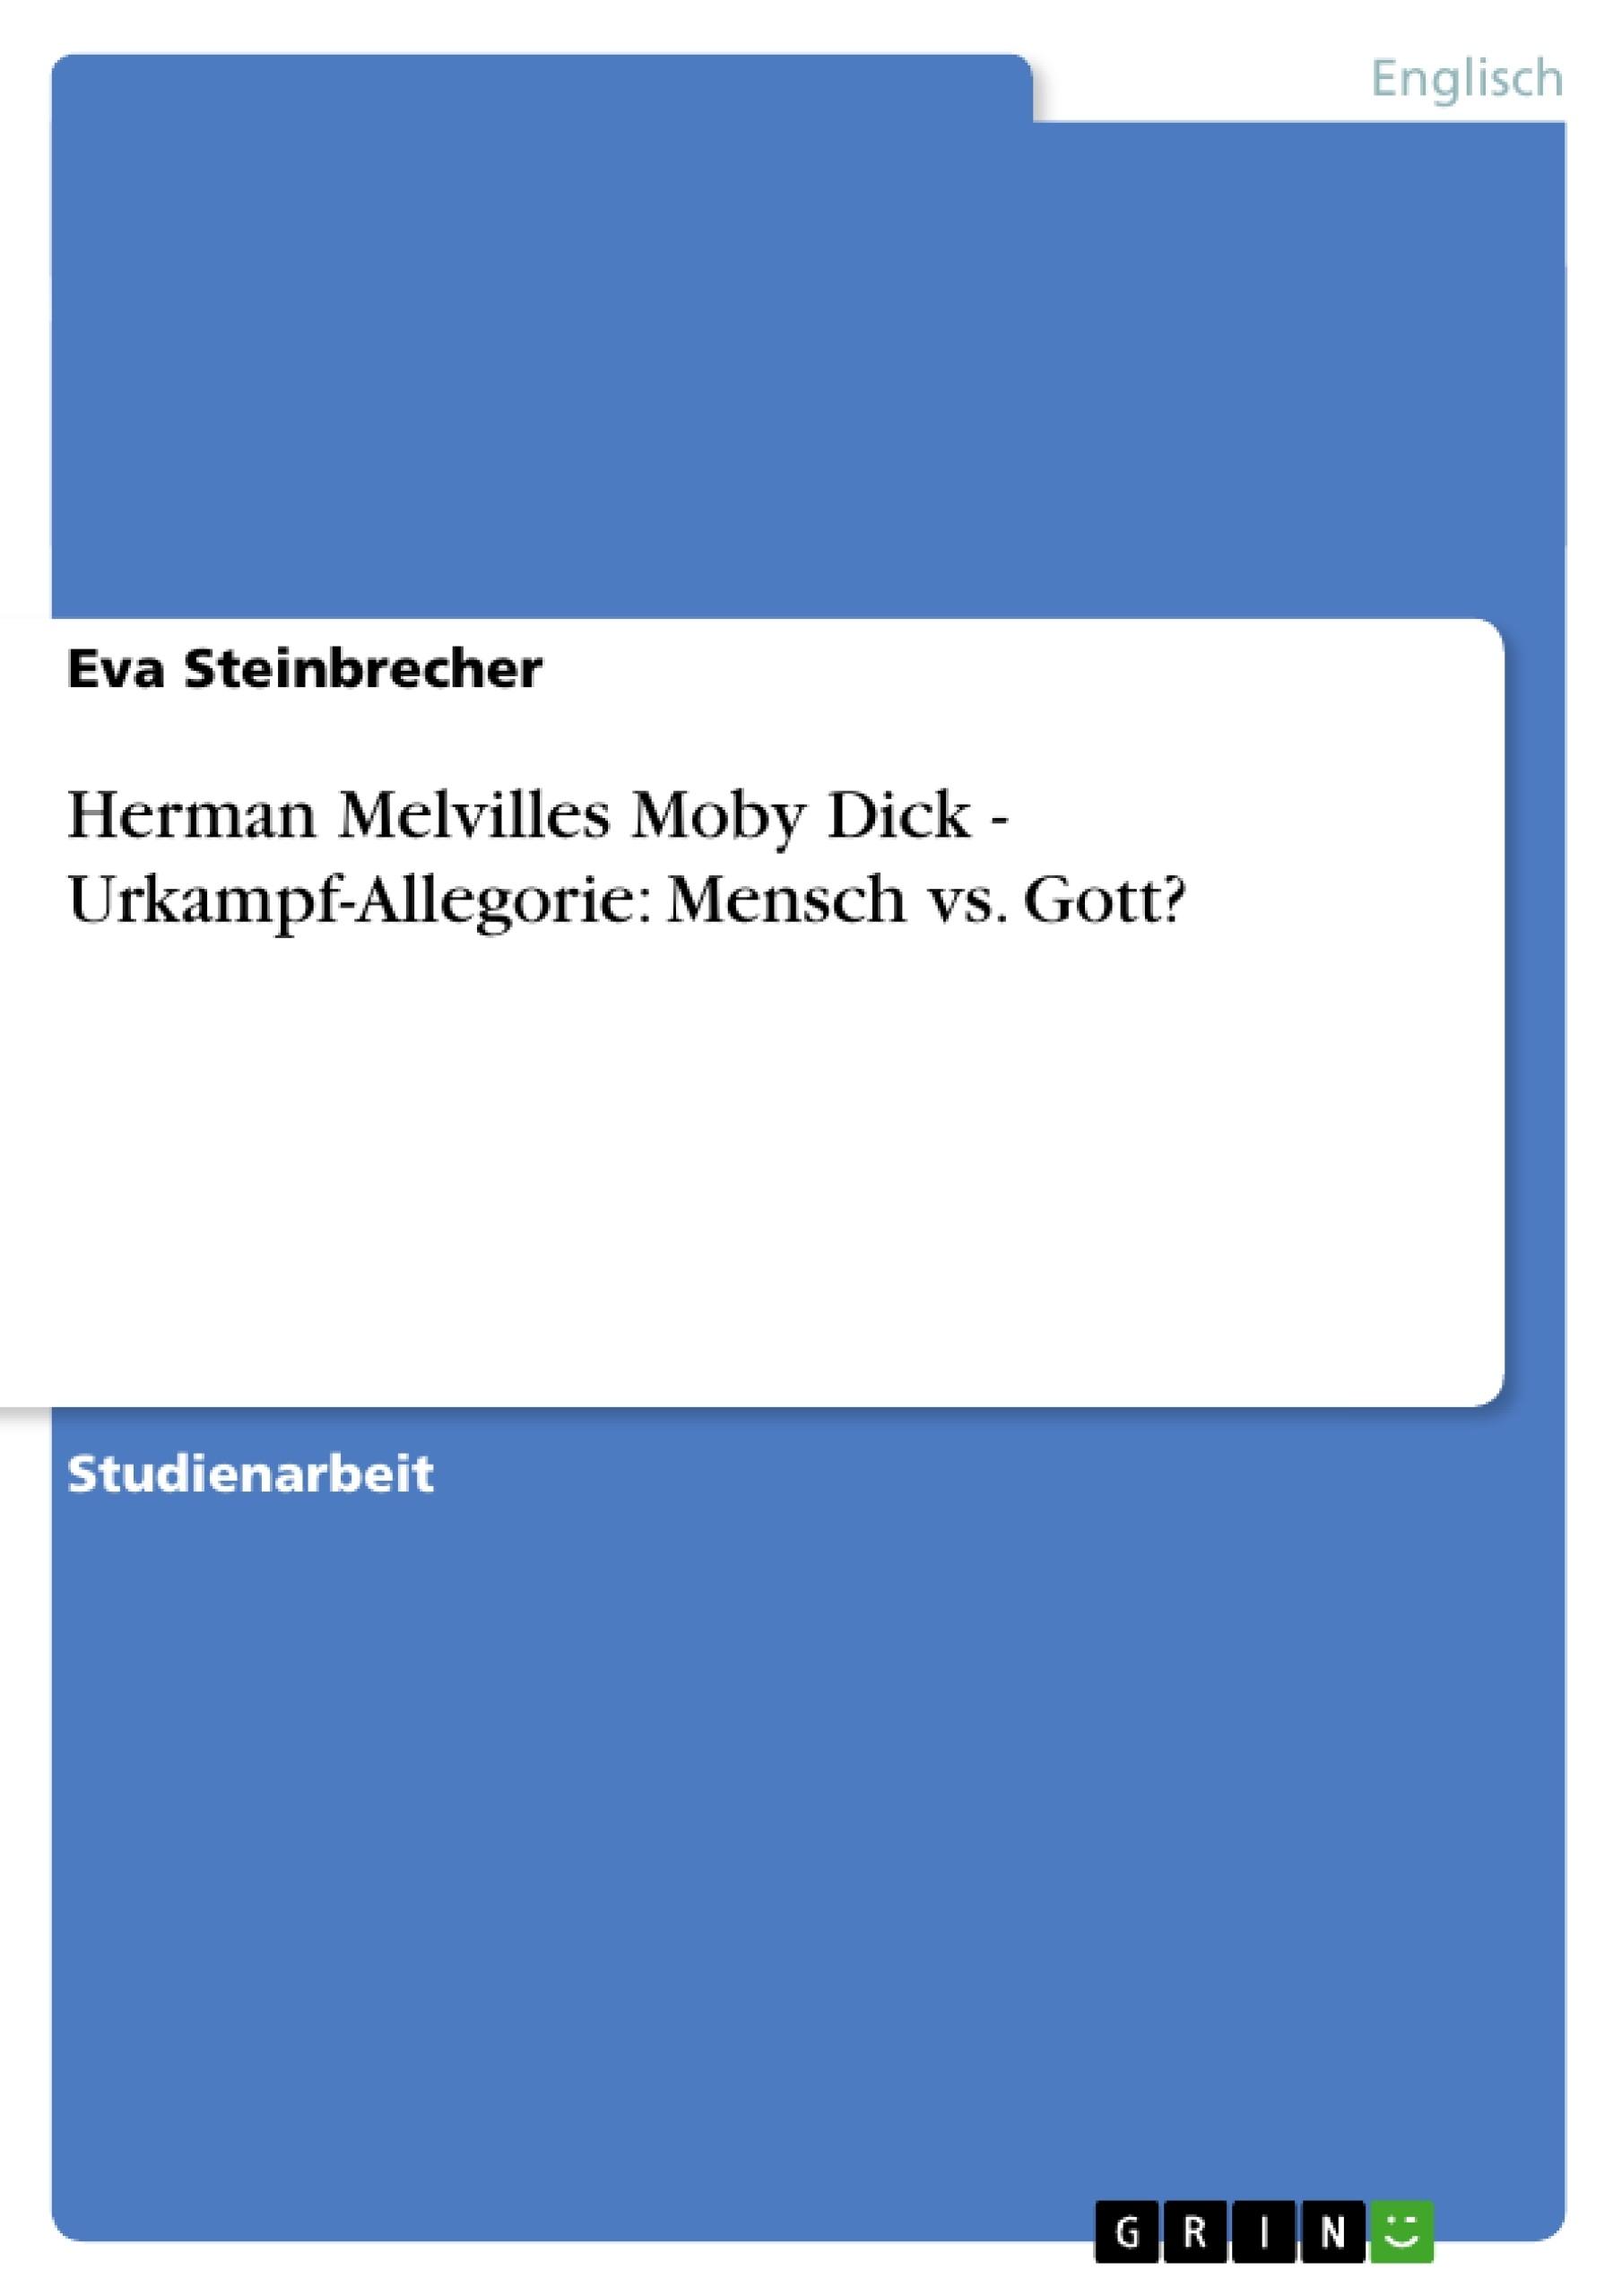 Titel: Herman Melvilles Moby Dick - Urkampf-Allegorie: Mensch vs. Gott?